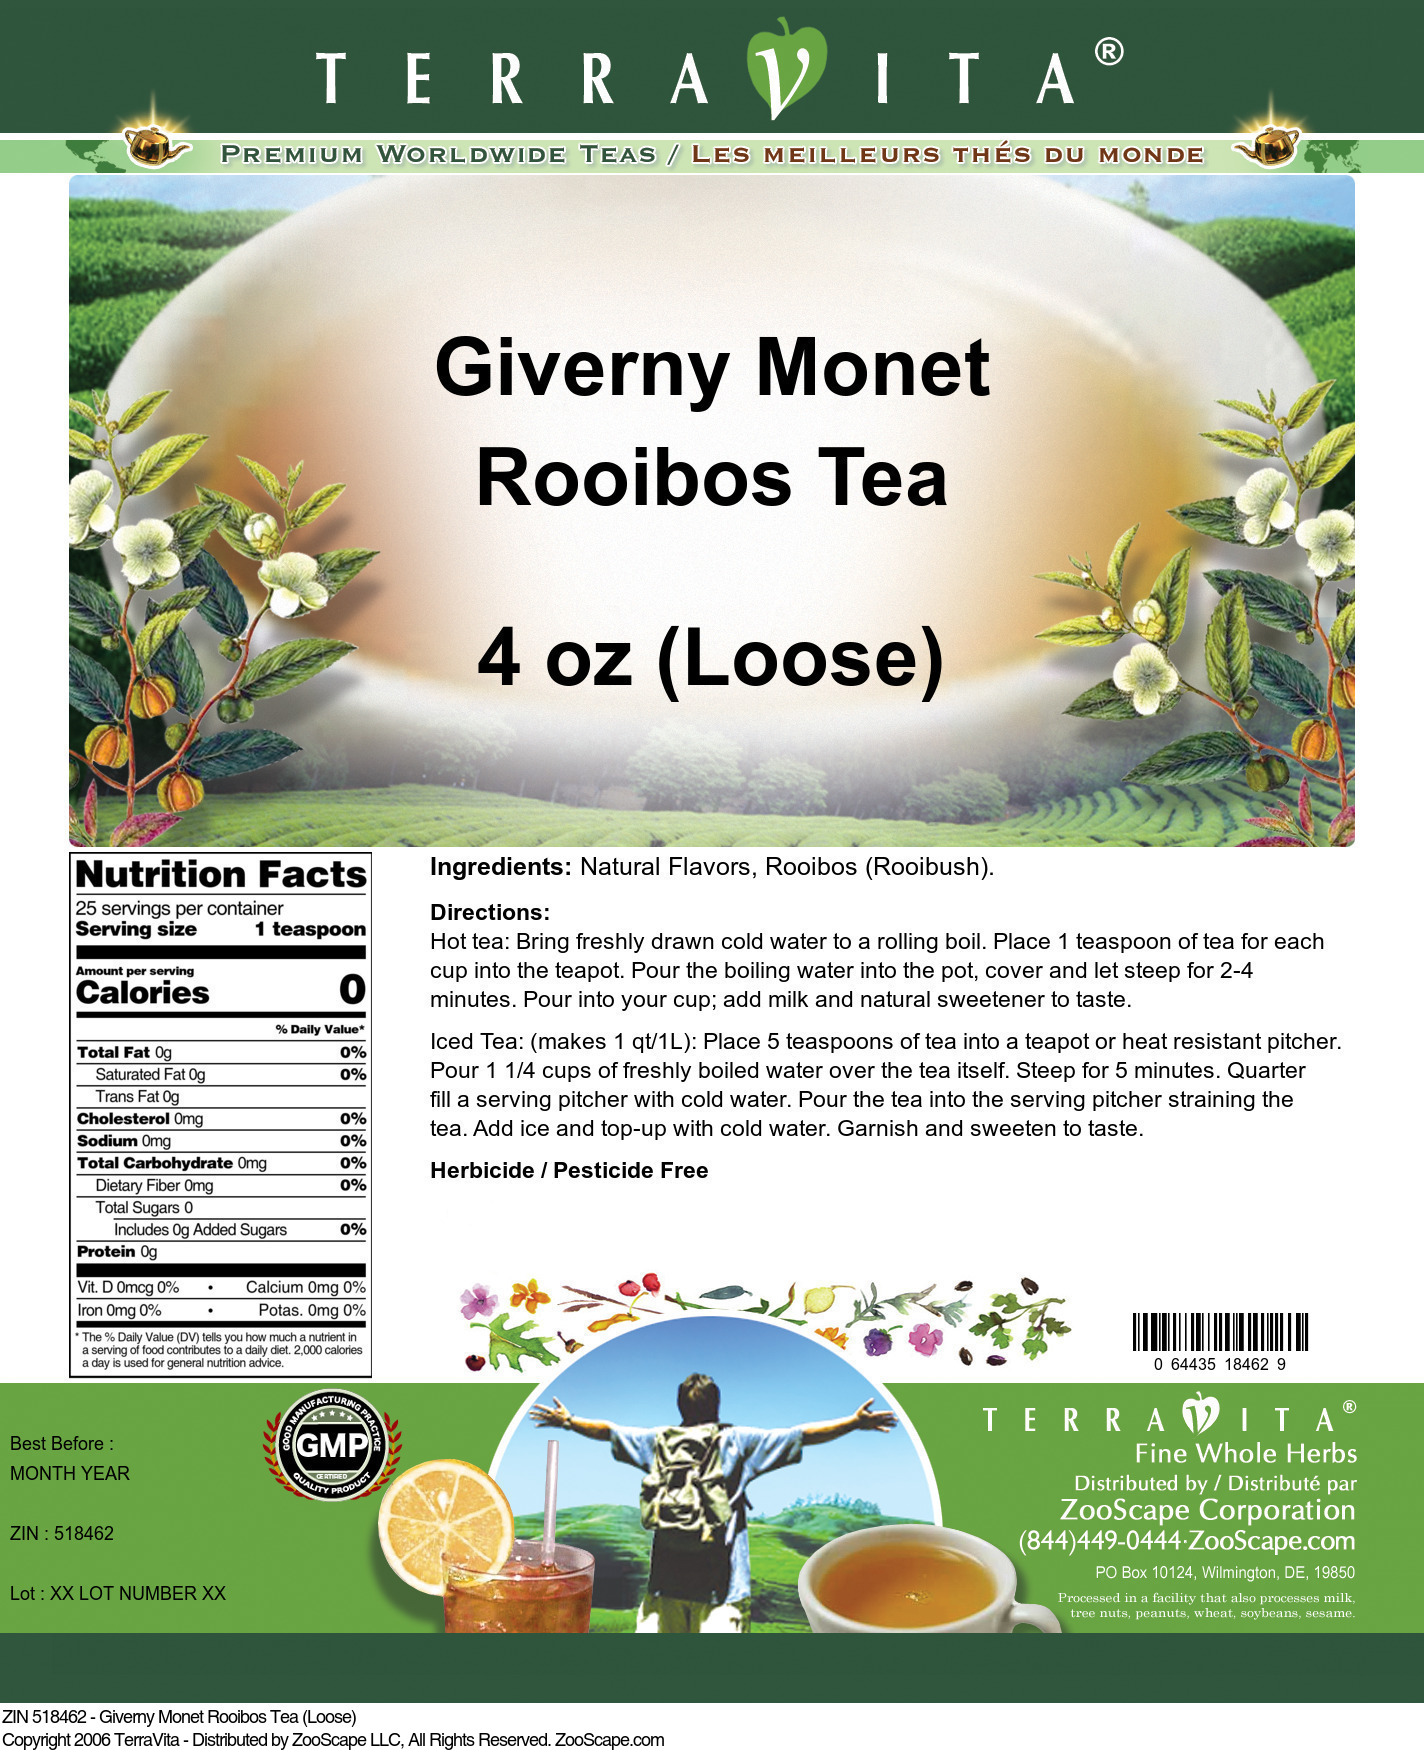 Giverny Monet Rooibos Tea (Loose)